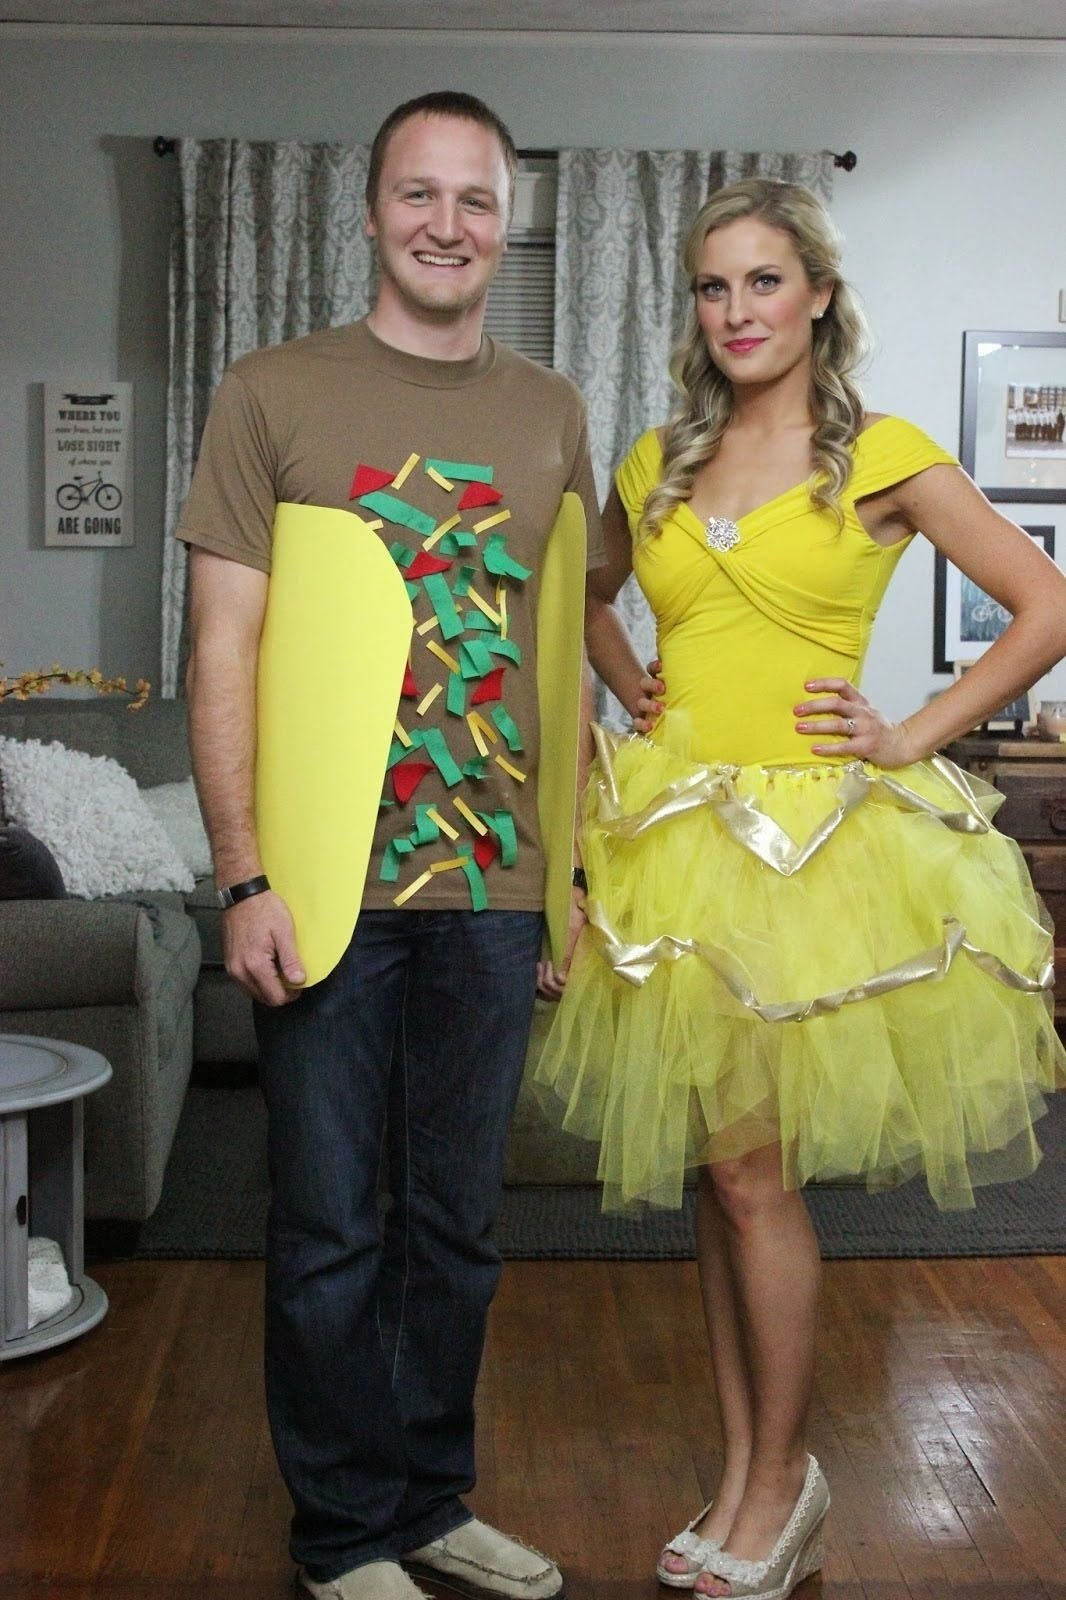 10 Famous Homemade Halloween Costume Ideas Couples 15 diy couples and family halloween costumes diy halloween 1 2020